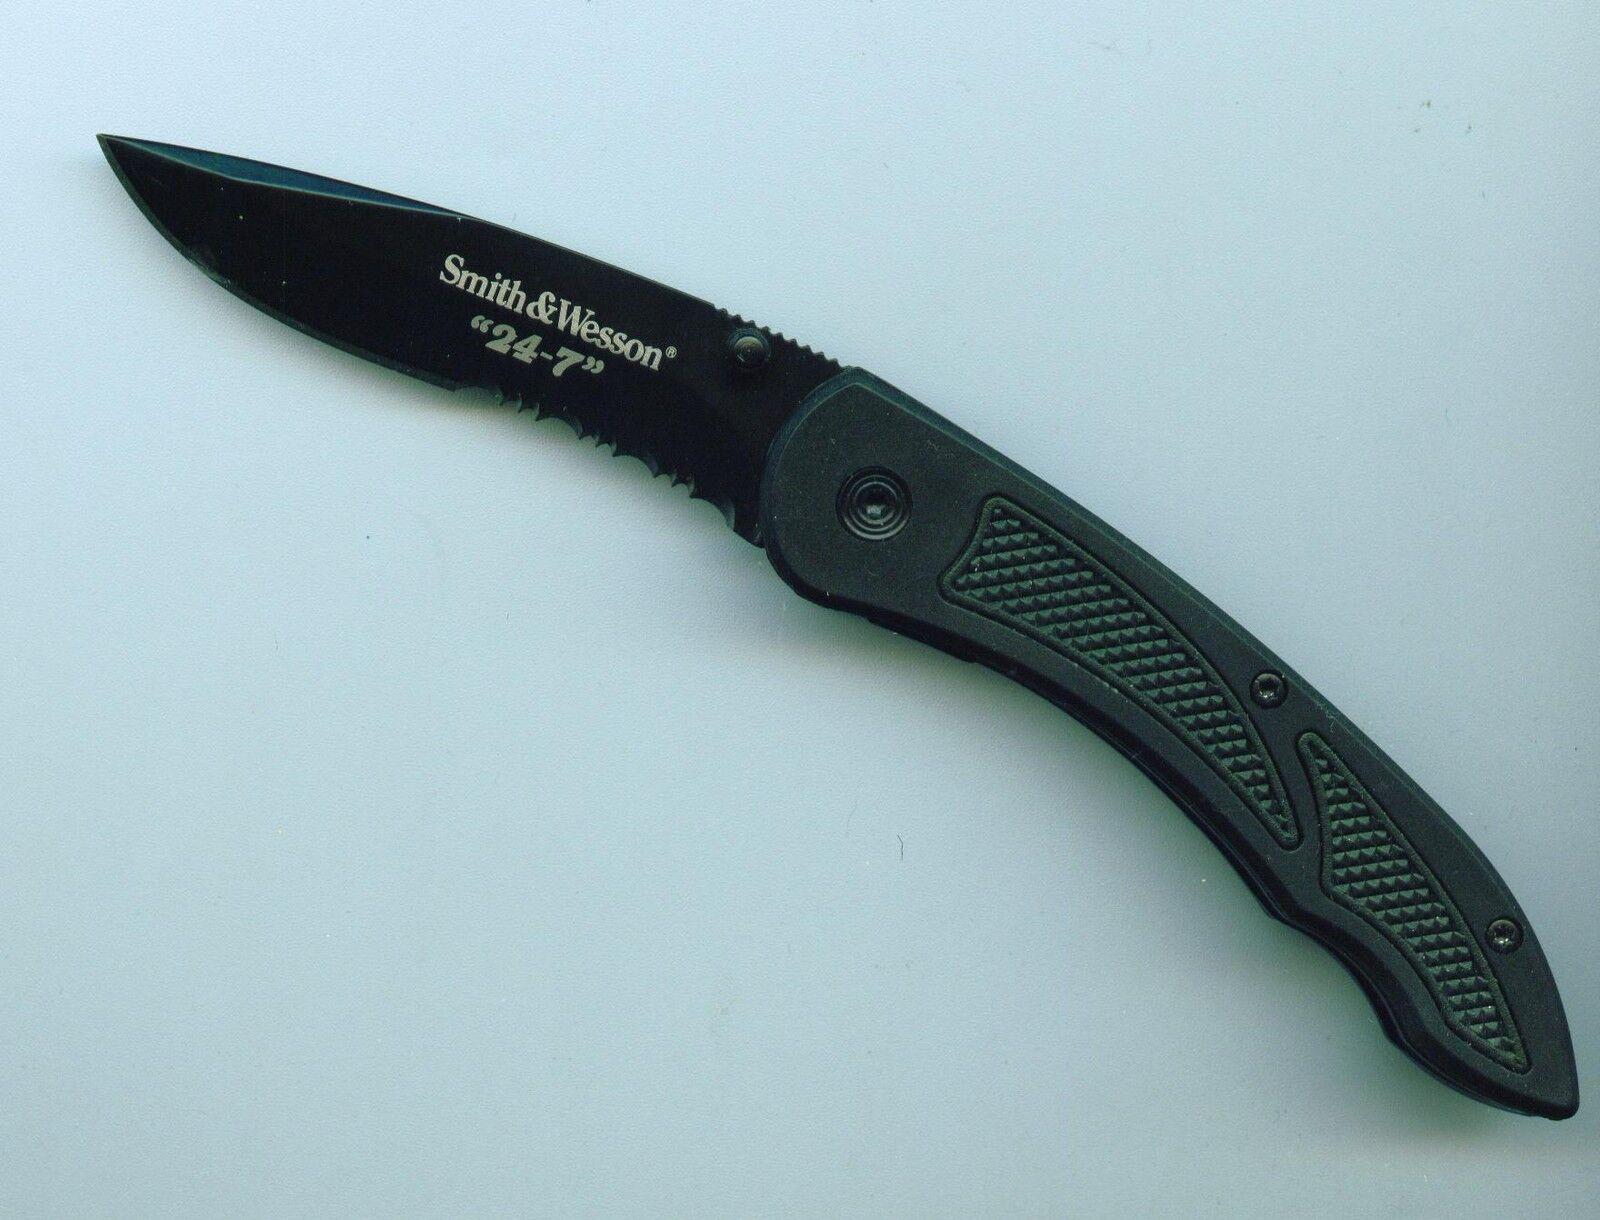 Smith & Wesson SWAT S&W Einhand-Messer SWLFS